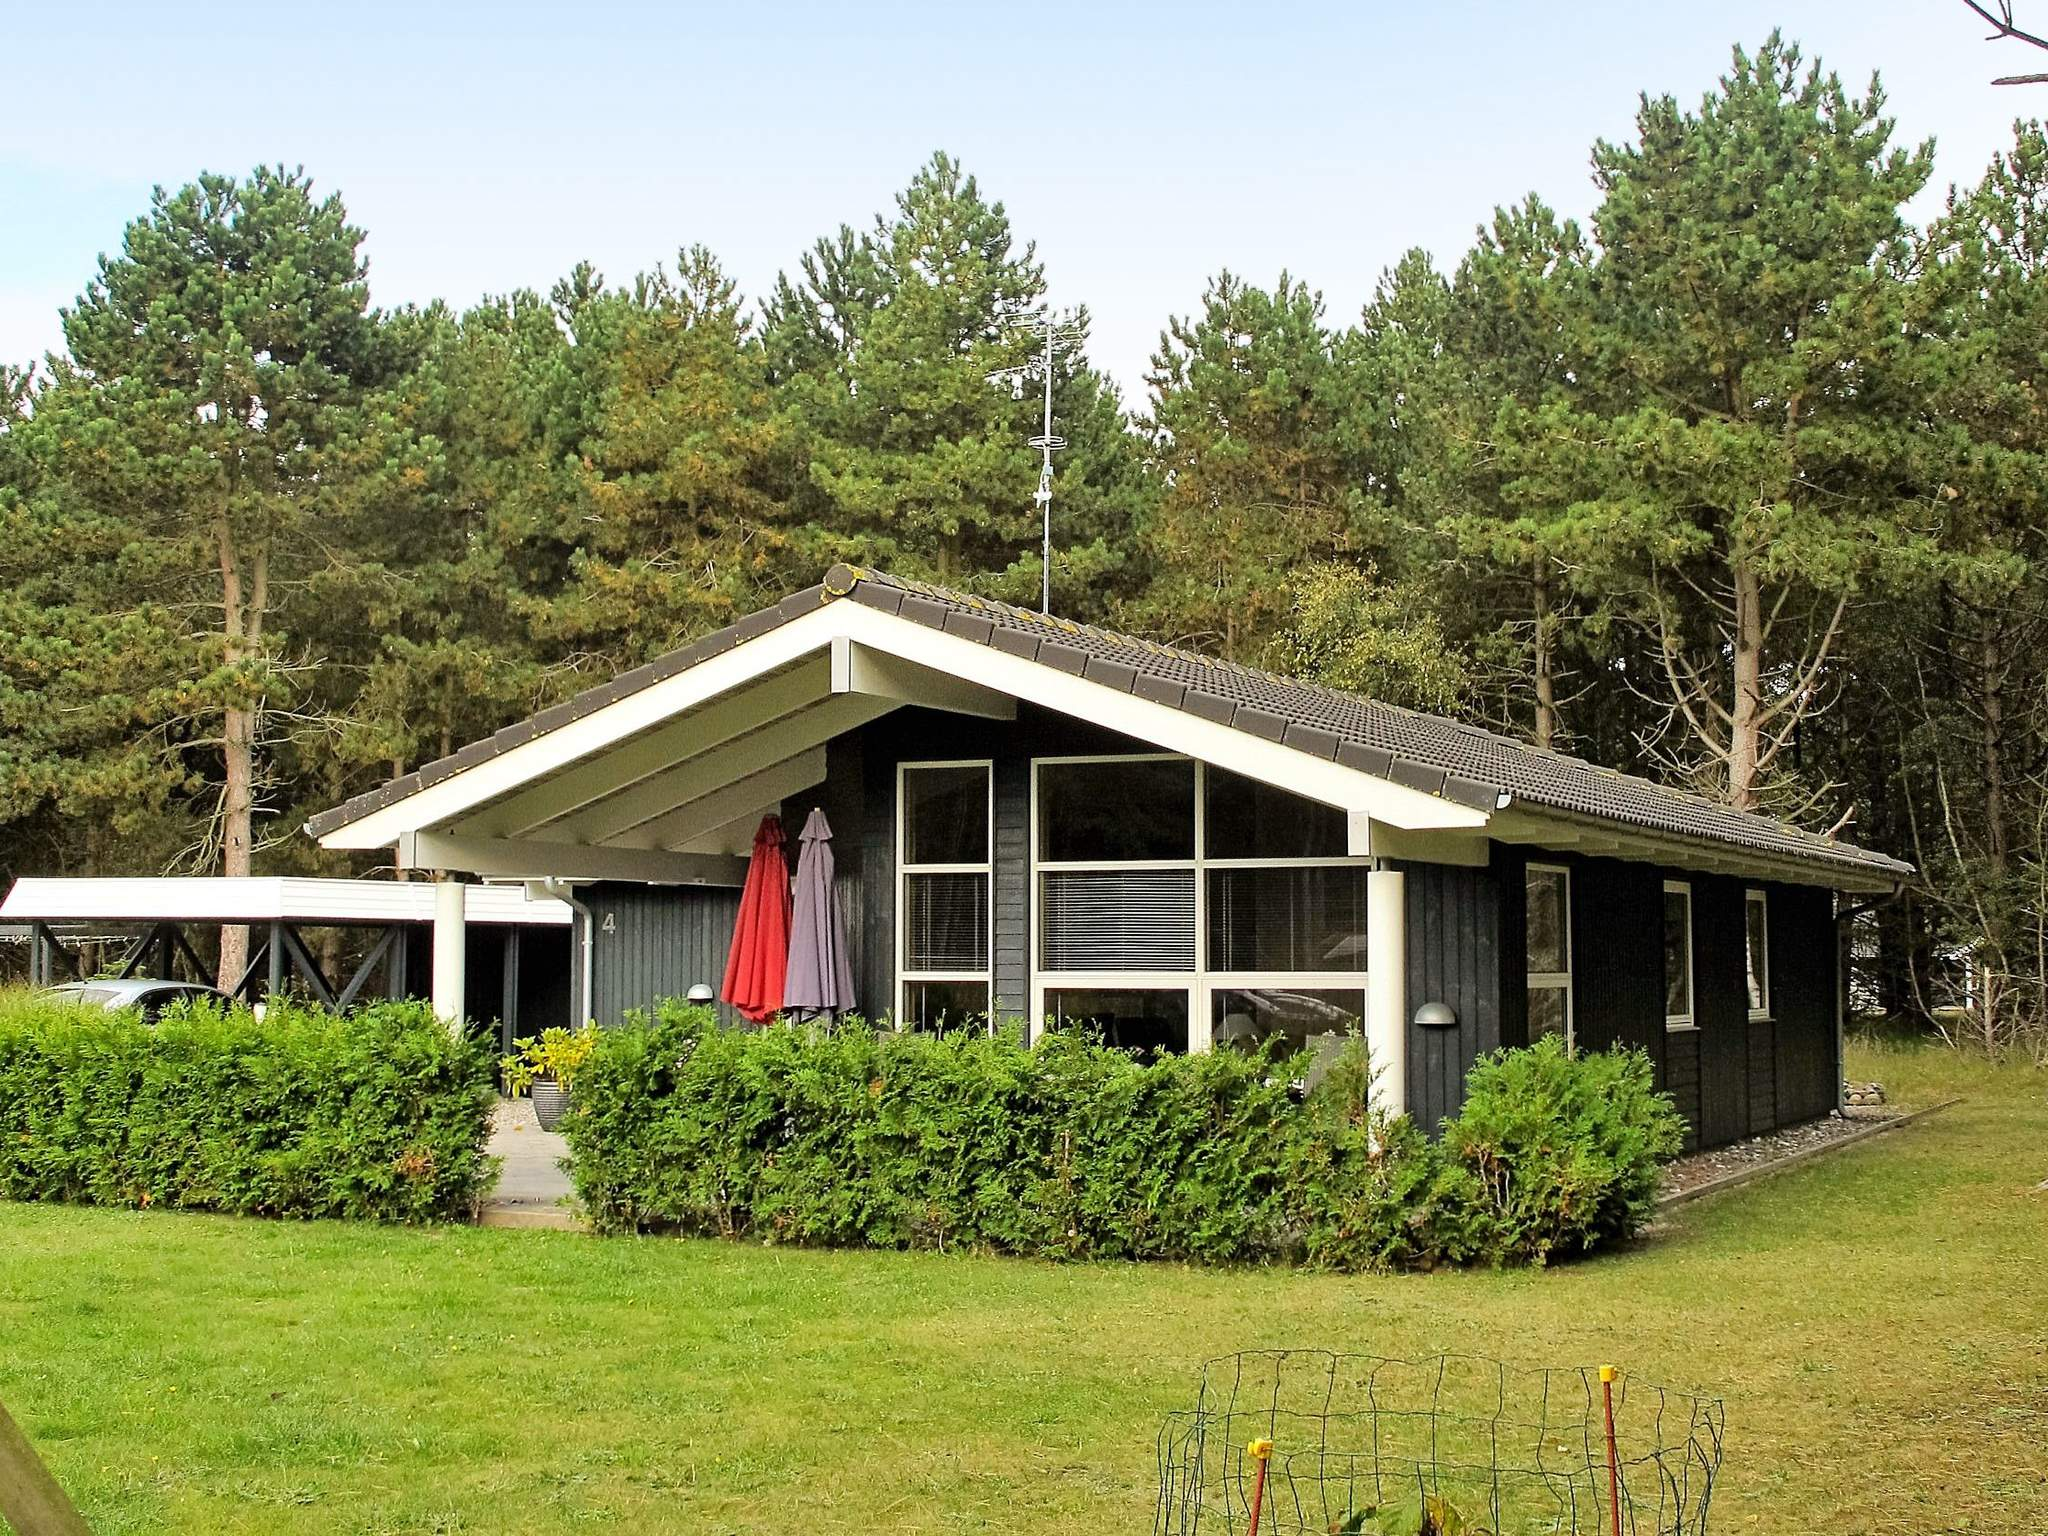 Ferienhaus Hyldtofte Østersøbad (93262), Hyldtofte Fæland, , Lolland, Dänemark, Bild 1